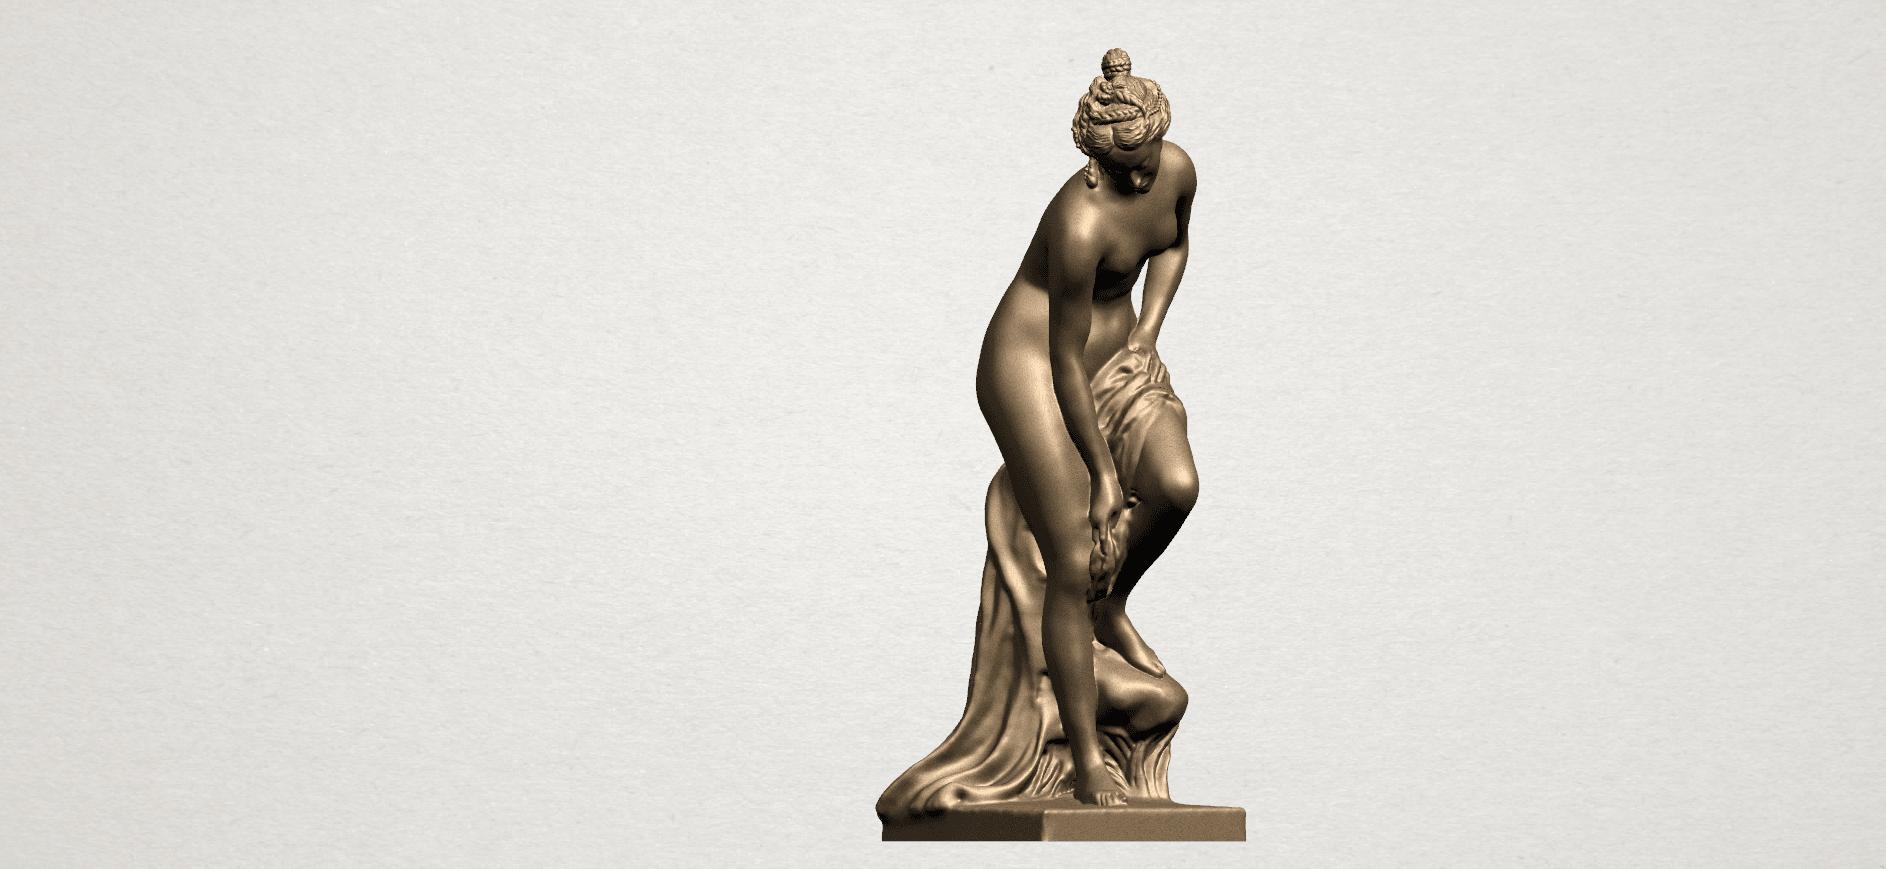 Naked Girl (iv) A07.png Download free STL file Naked Girl 04 • 3D print design, GeorgesNikkei